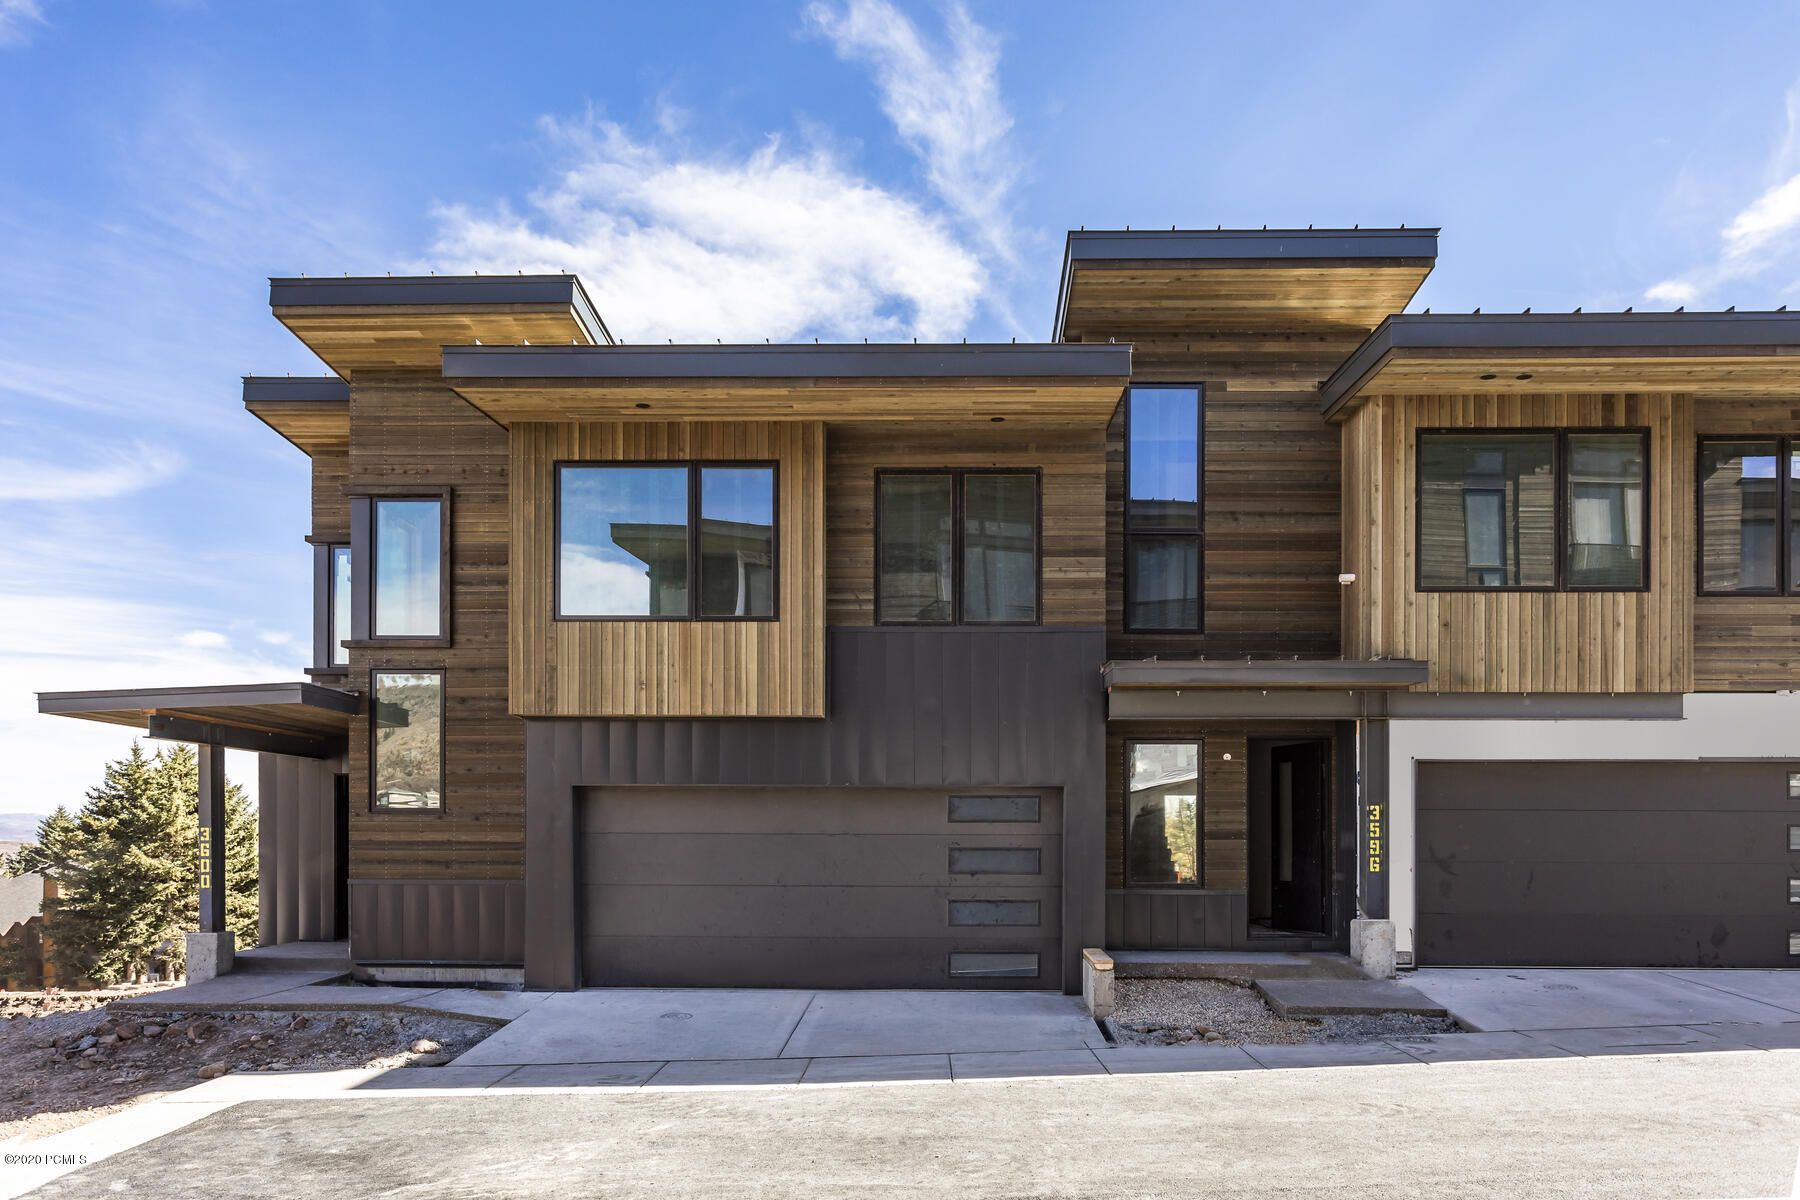 3541 Ridgeline Drive, Park City, Utah 84098, 5 Bedrooms Bedrooms, ,5 BathroomsBathrooms,Condominium,For Sale,Ridgeline,12002800